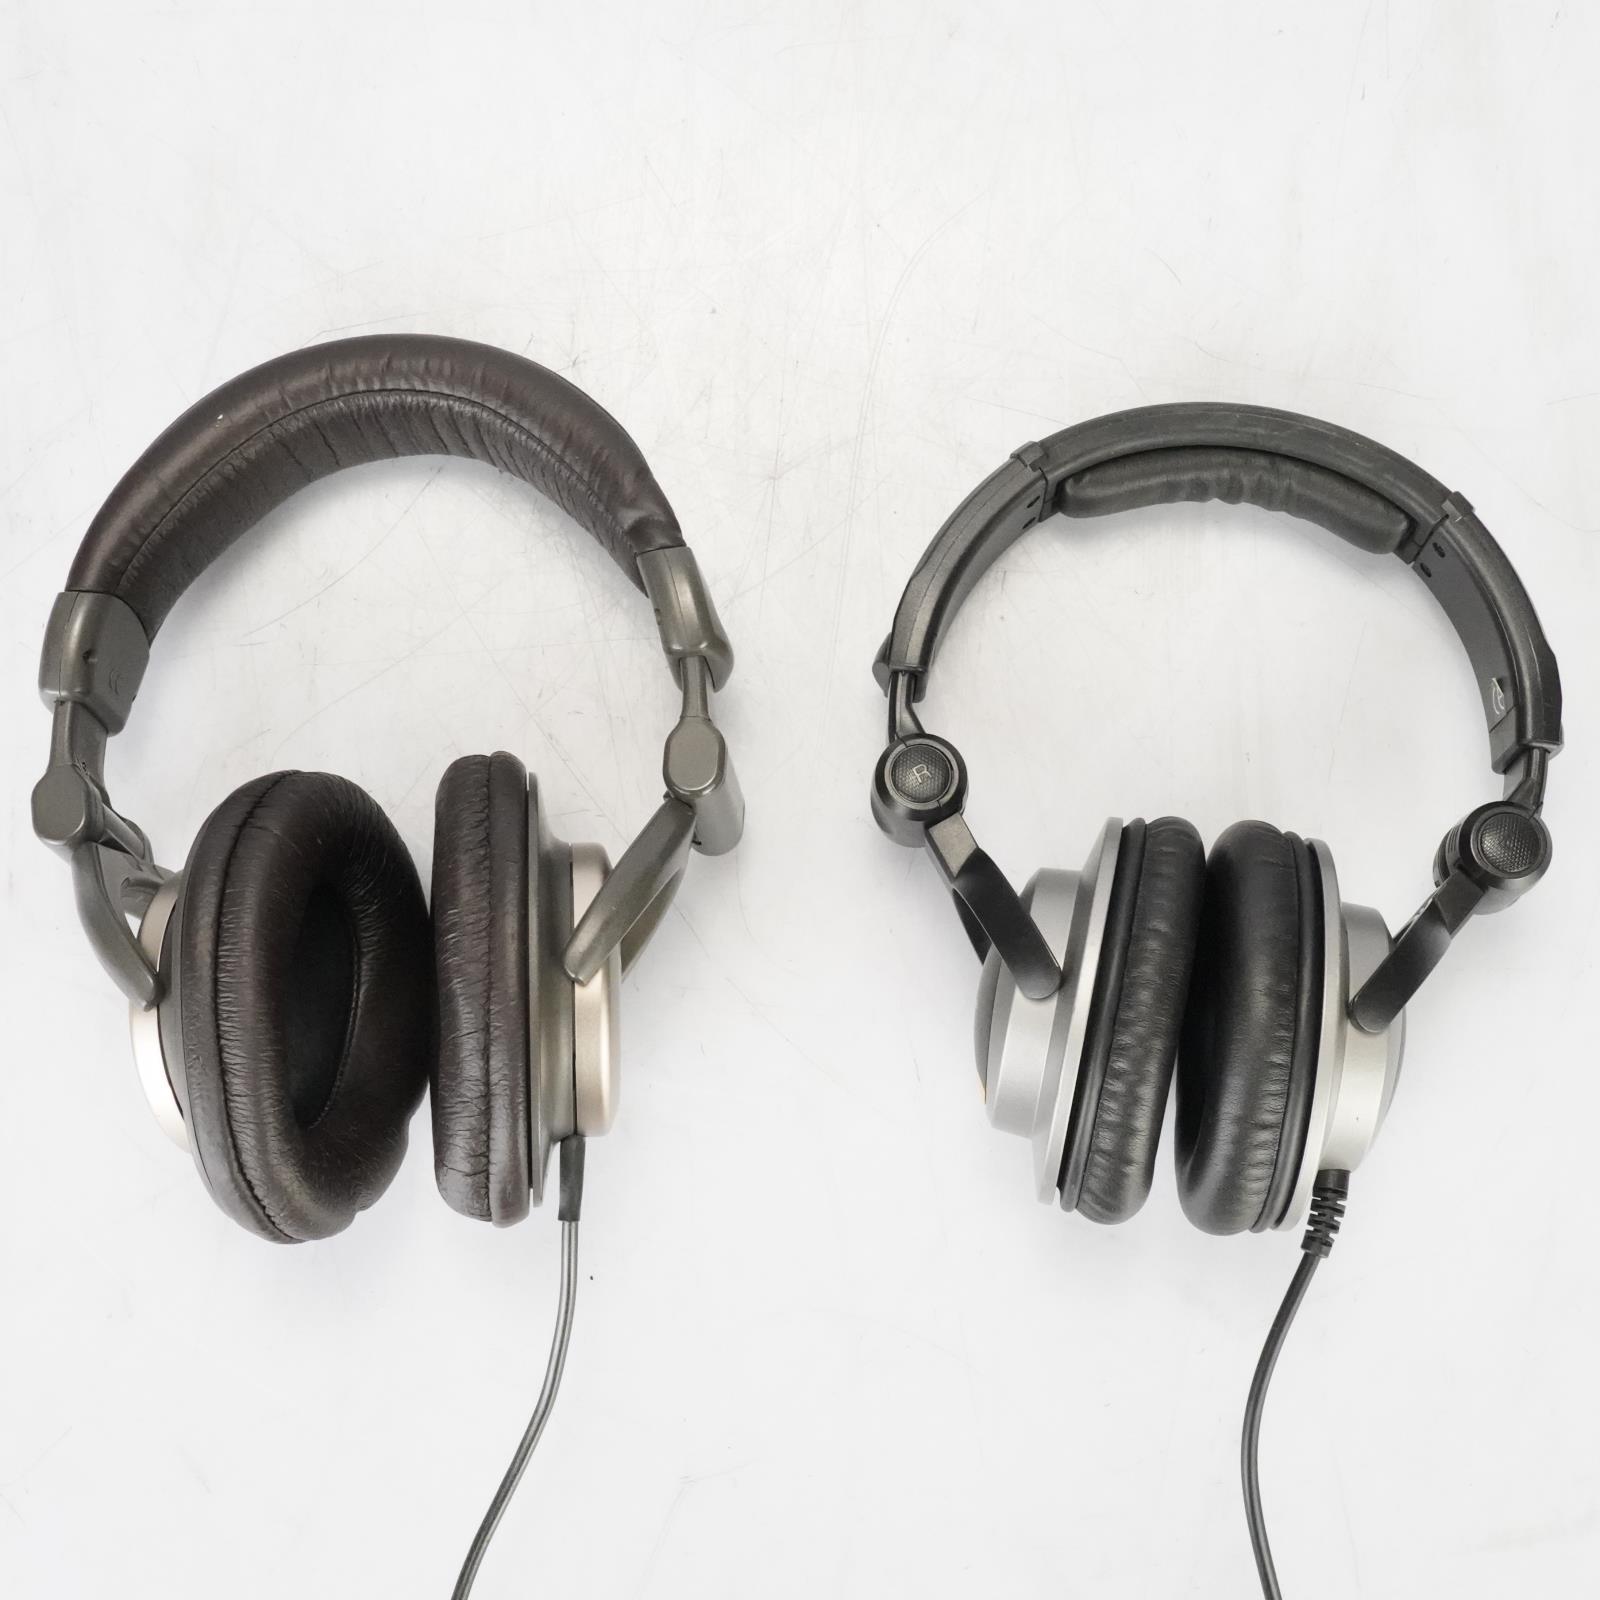 Sony MDR-V900 & Ultrasone HFI-650 Studio Headphones Owned by Ed Cherney #39050